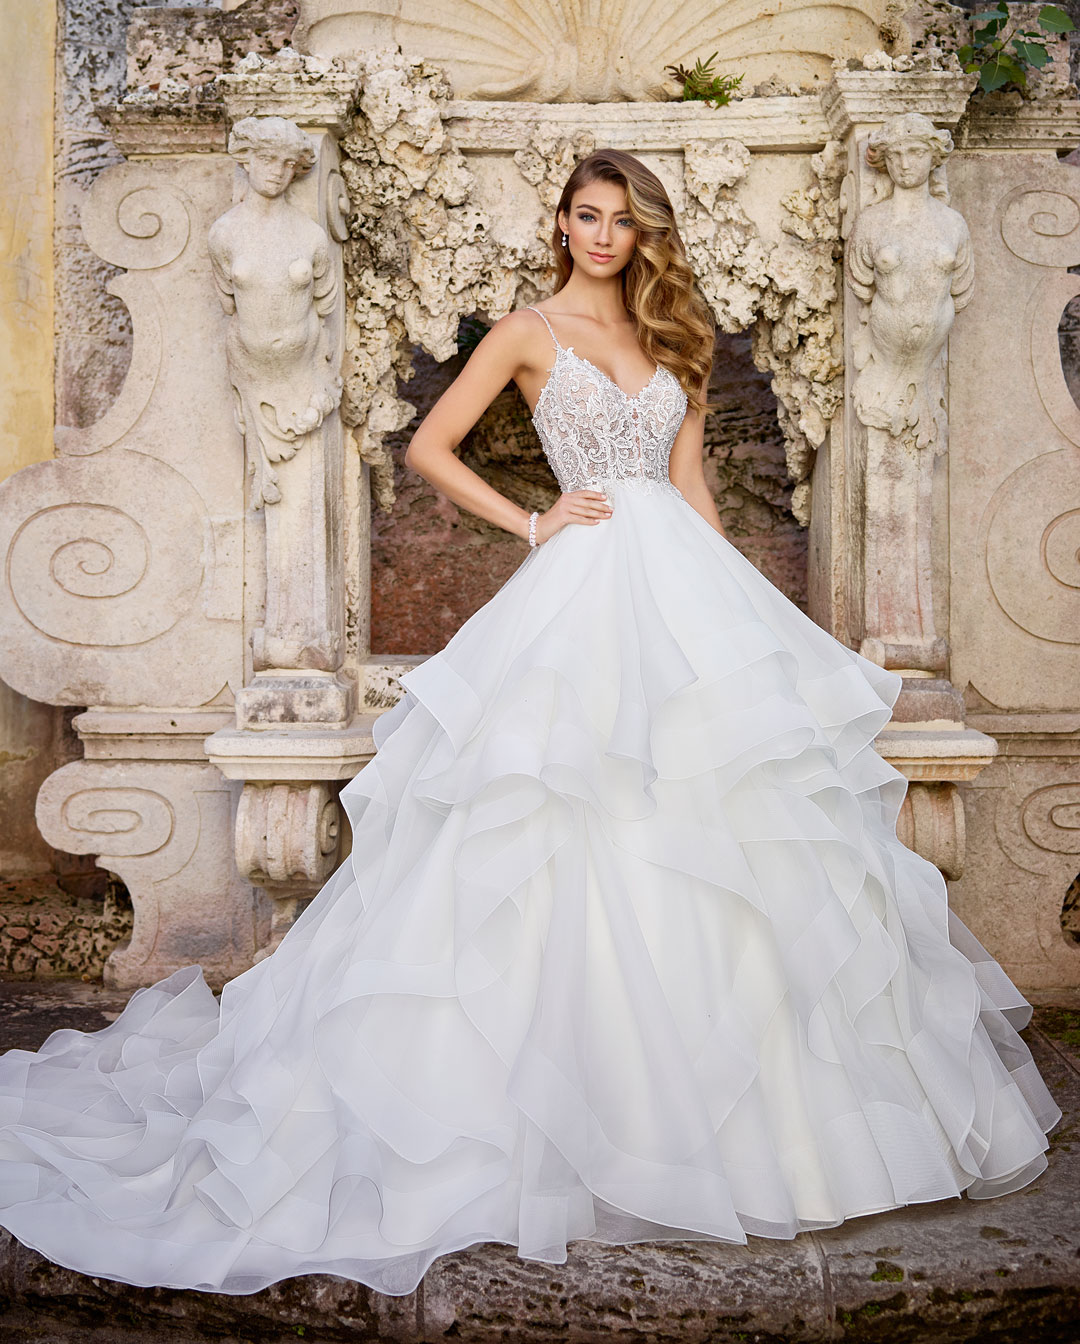 Wedding Dresses Queensland: Queensland Wedding And Bride Magazine